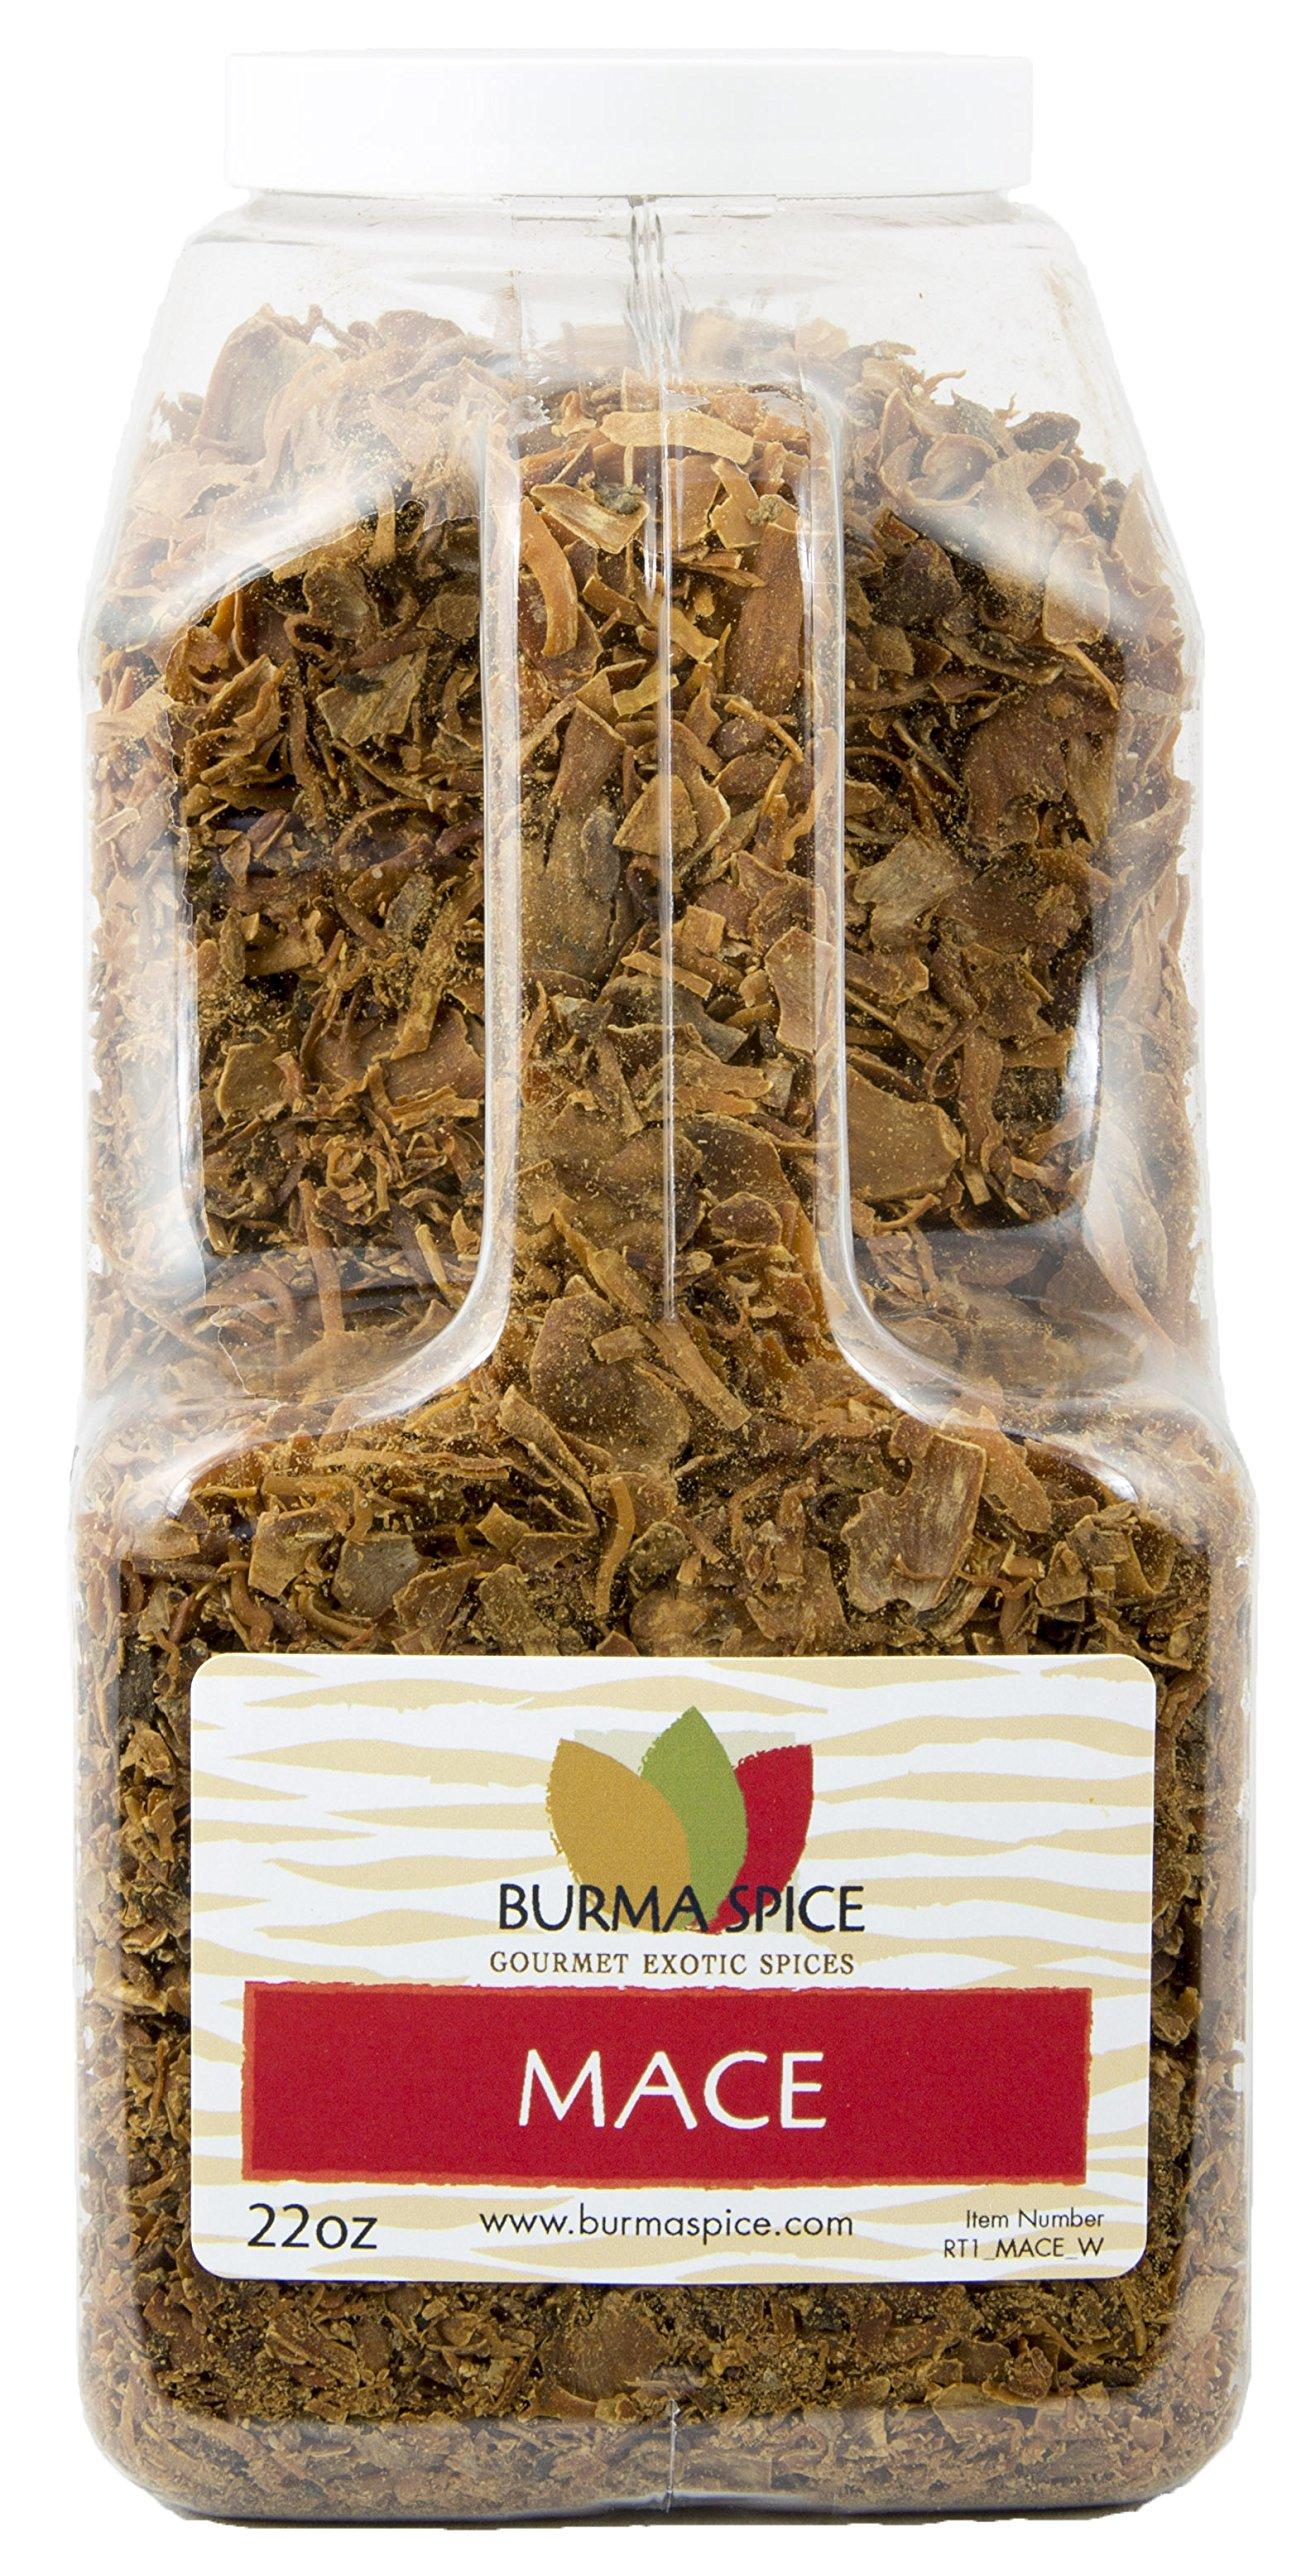 Blade Mace (Javathri) Natural Aromatic Pure Loose Herb Spice Kosher (22oz.)